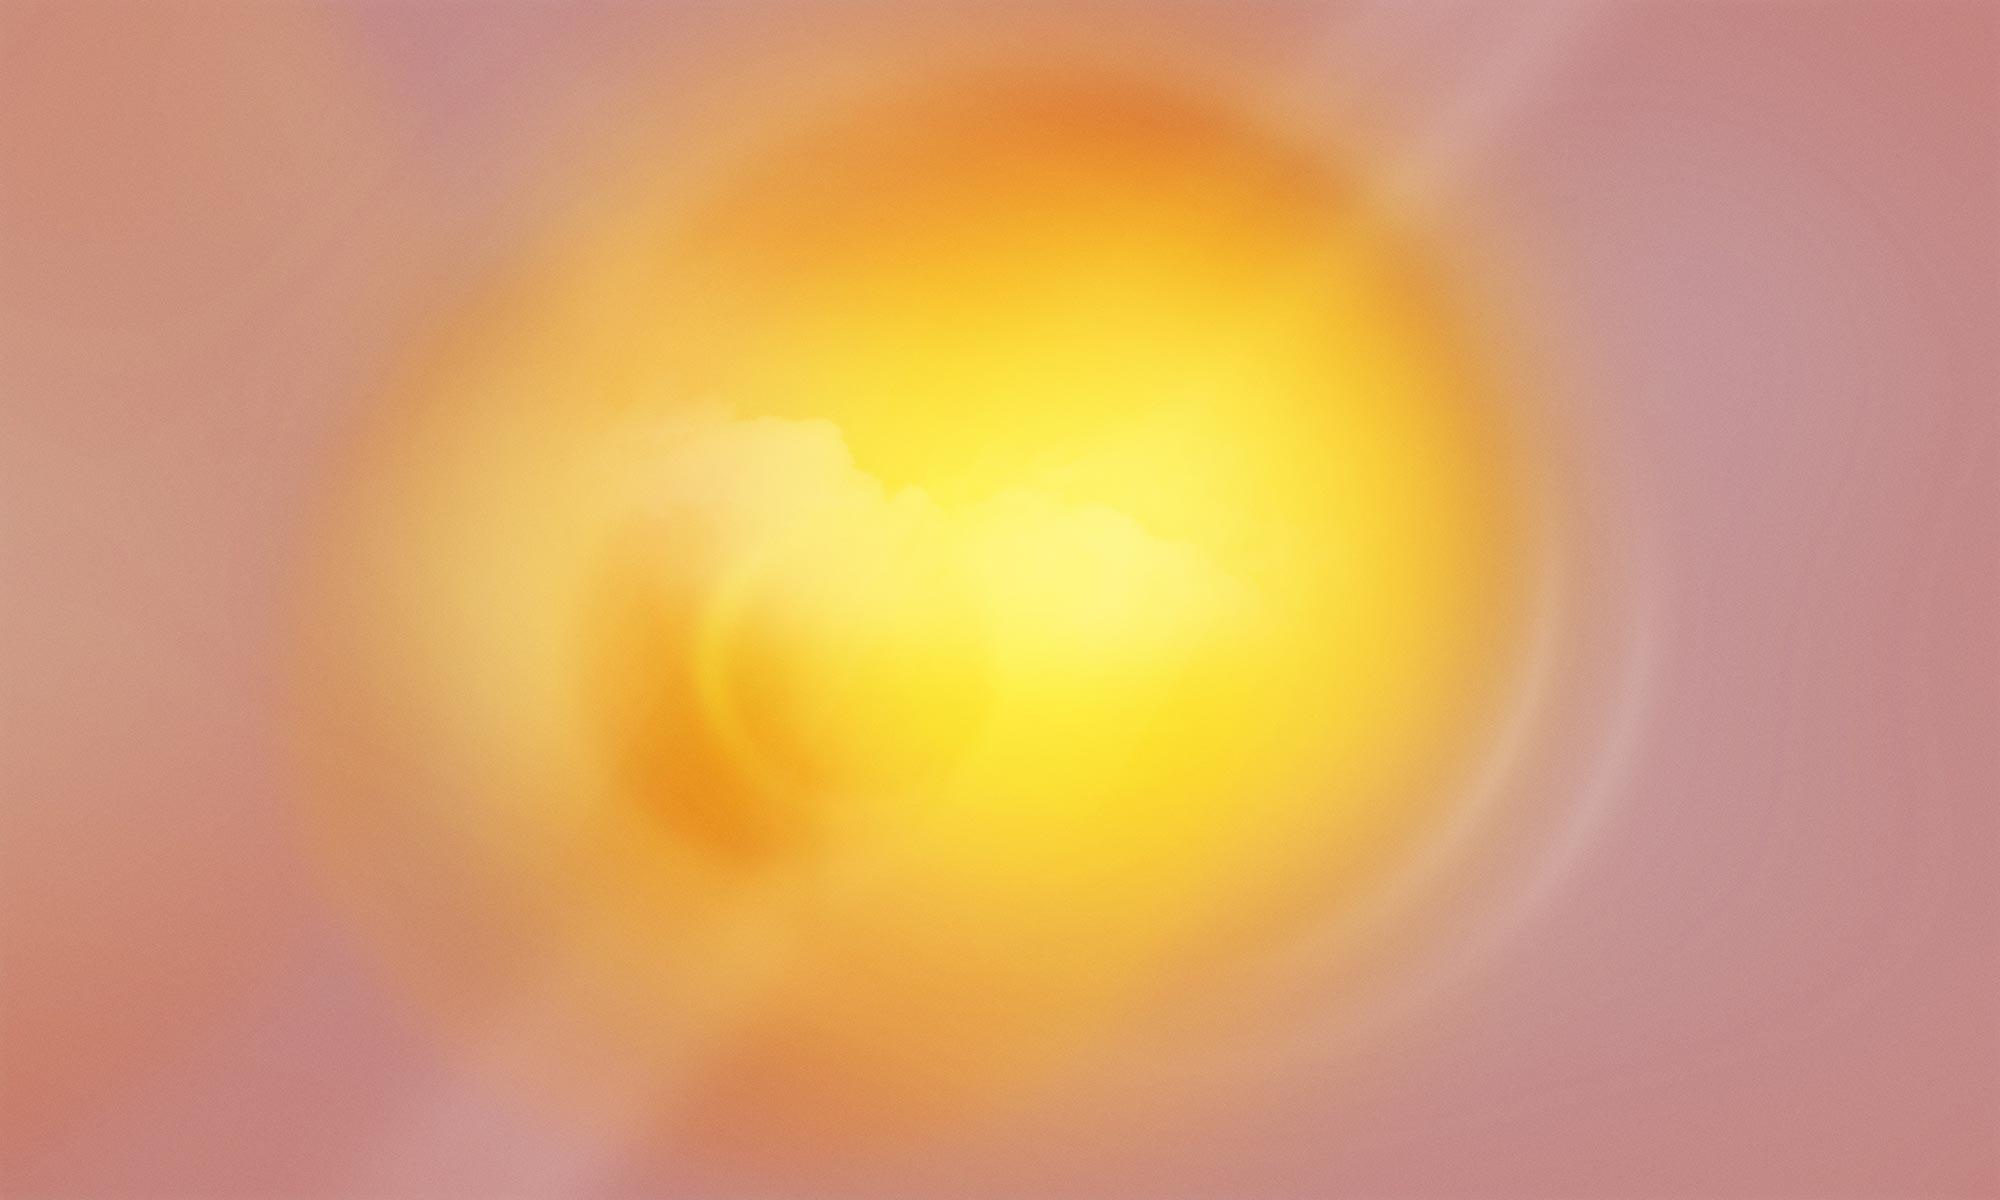 sunburst-bg